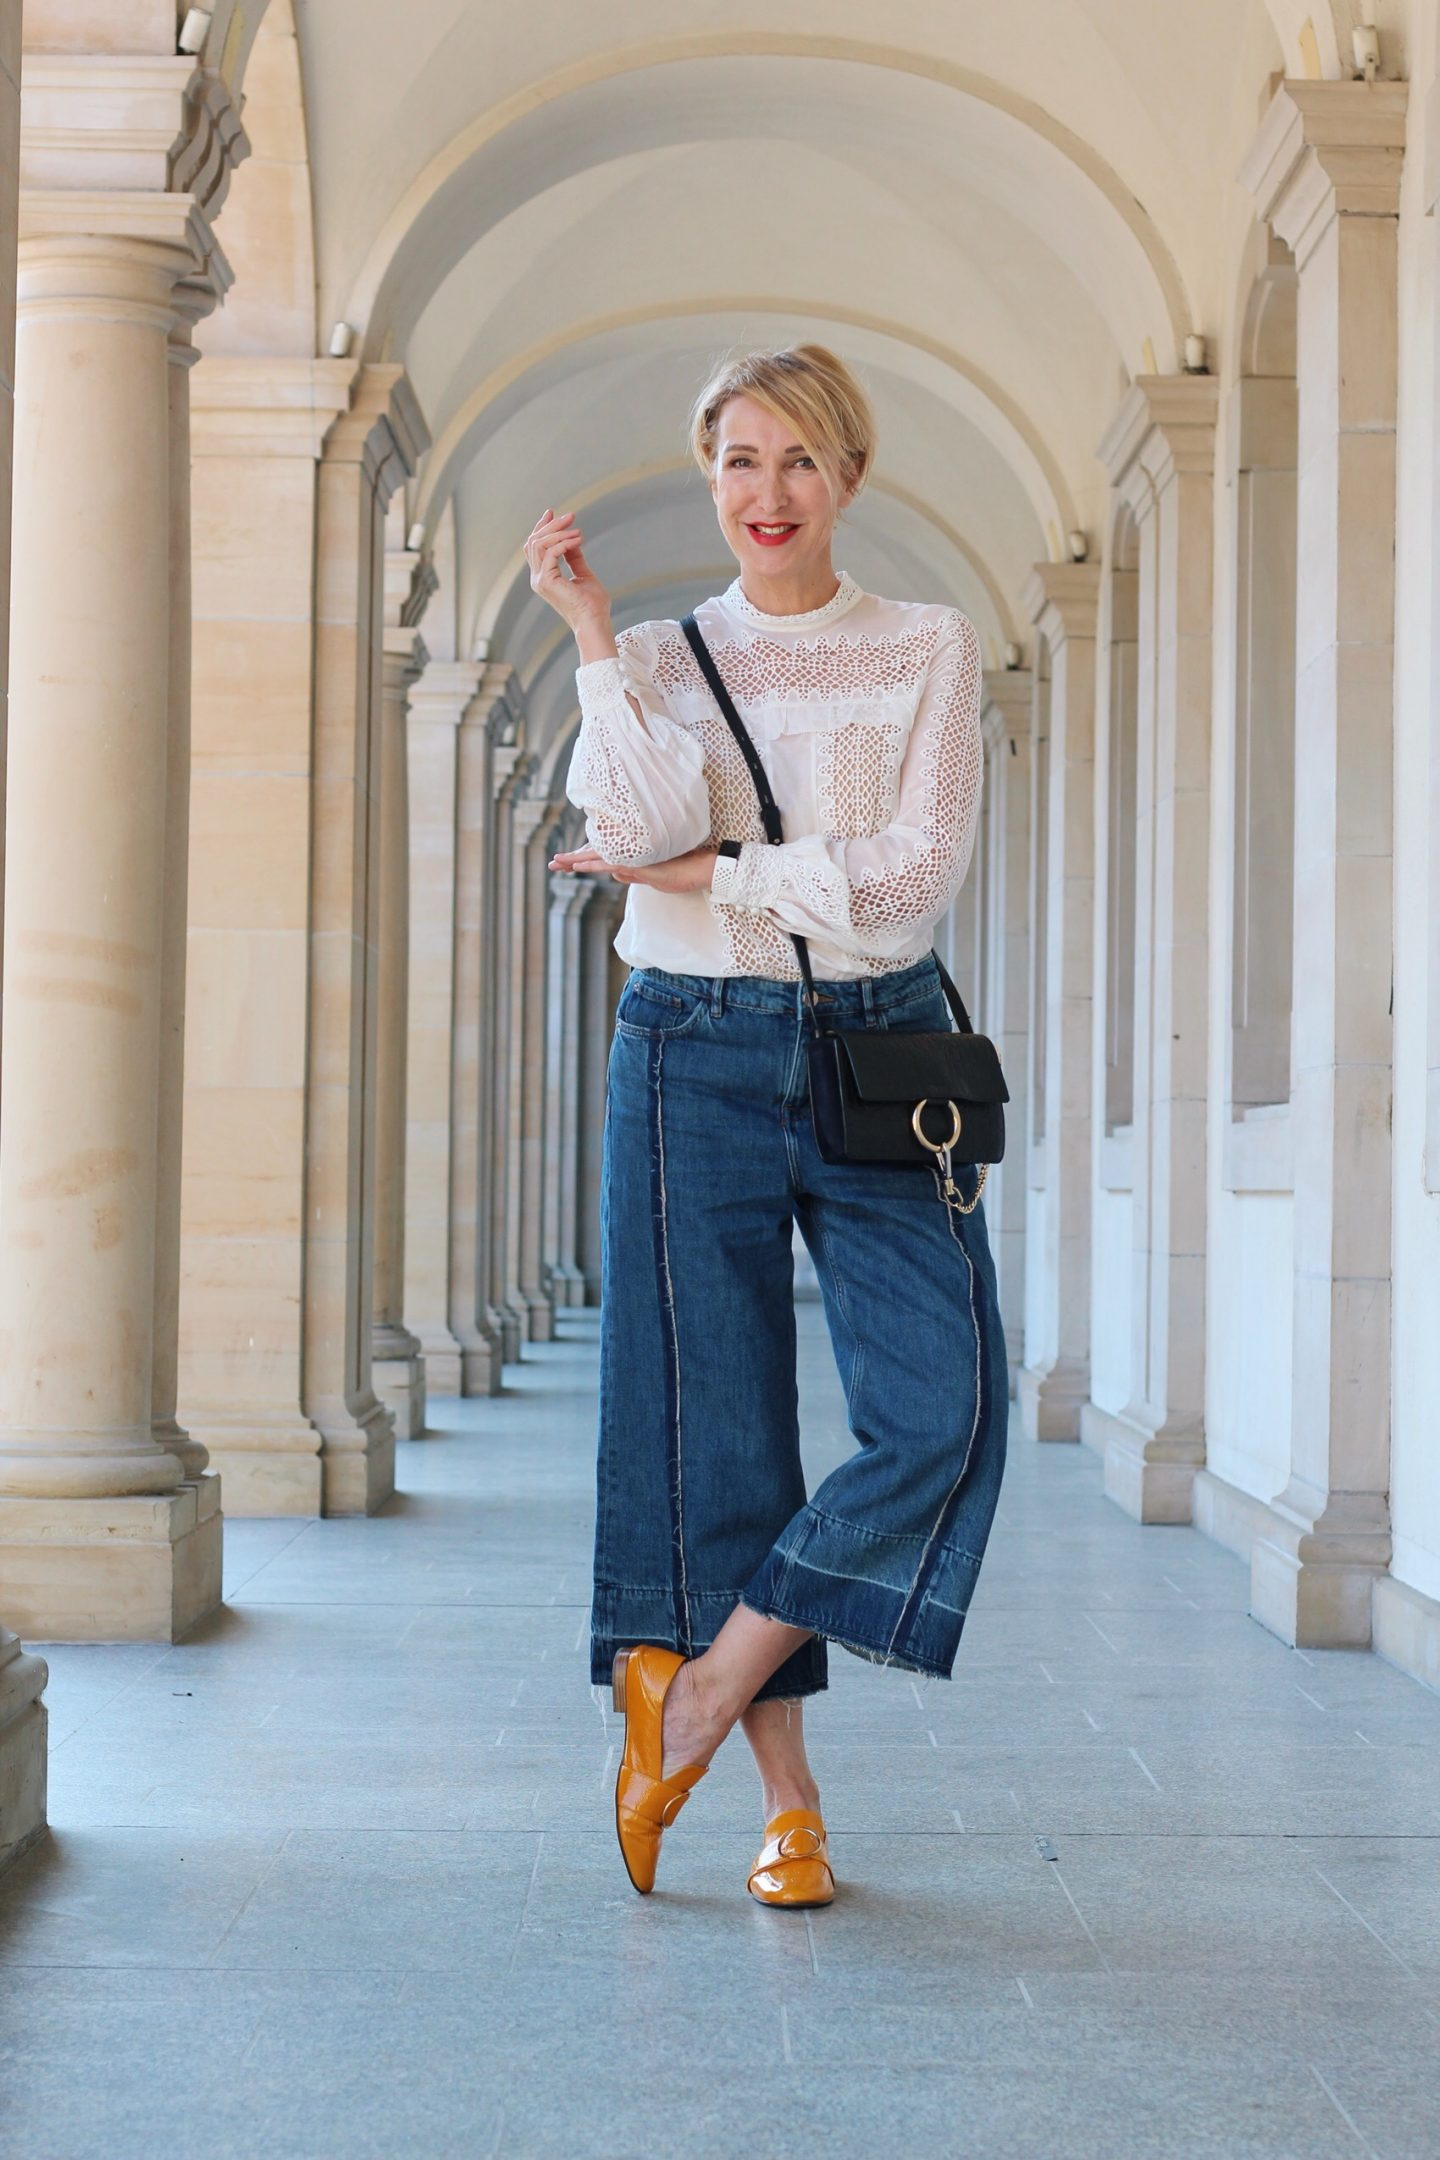 Glamupyourlifestyle ü-40-blog Frauen Solidarität ü-50-Blog Womensupport ue-40-blog ue-50-blog